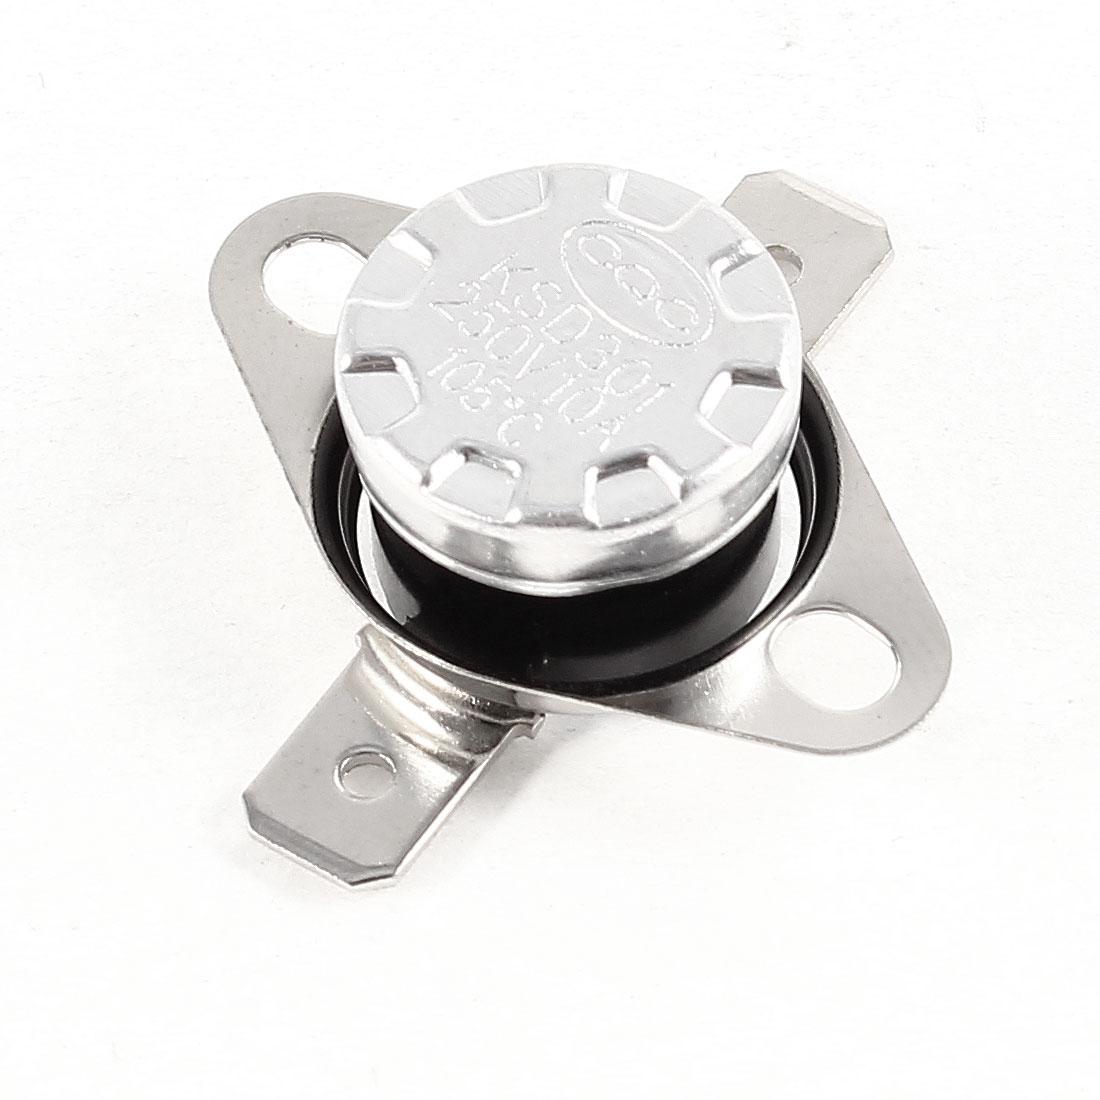 KSD301 AC 250V 10A 105C Celsius NC Temperature Control Switch Thermostat